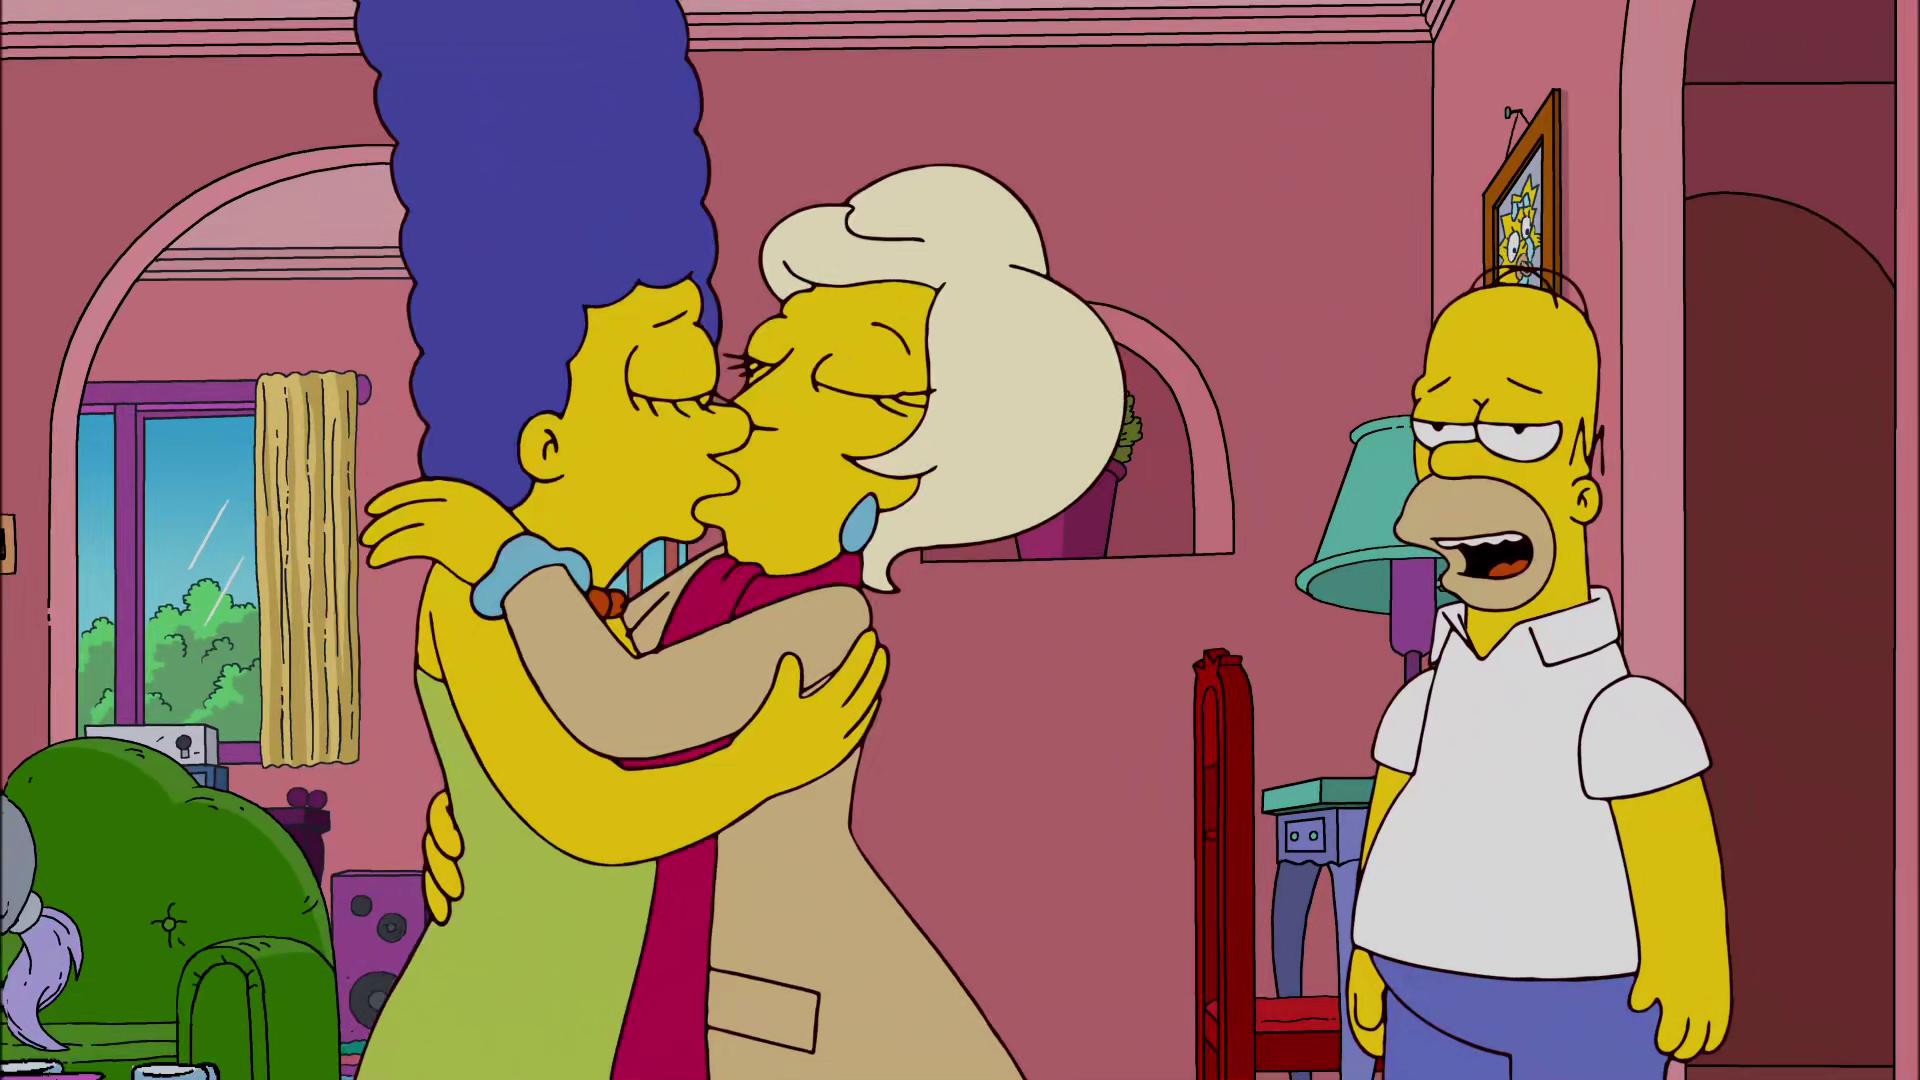 Vanessa hudgens kissed a girl